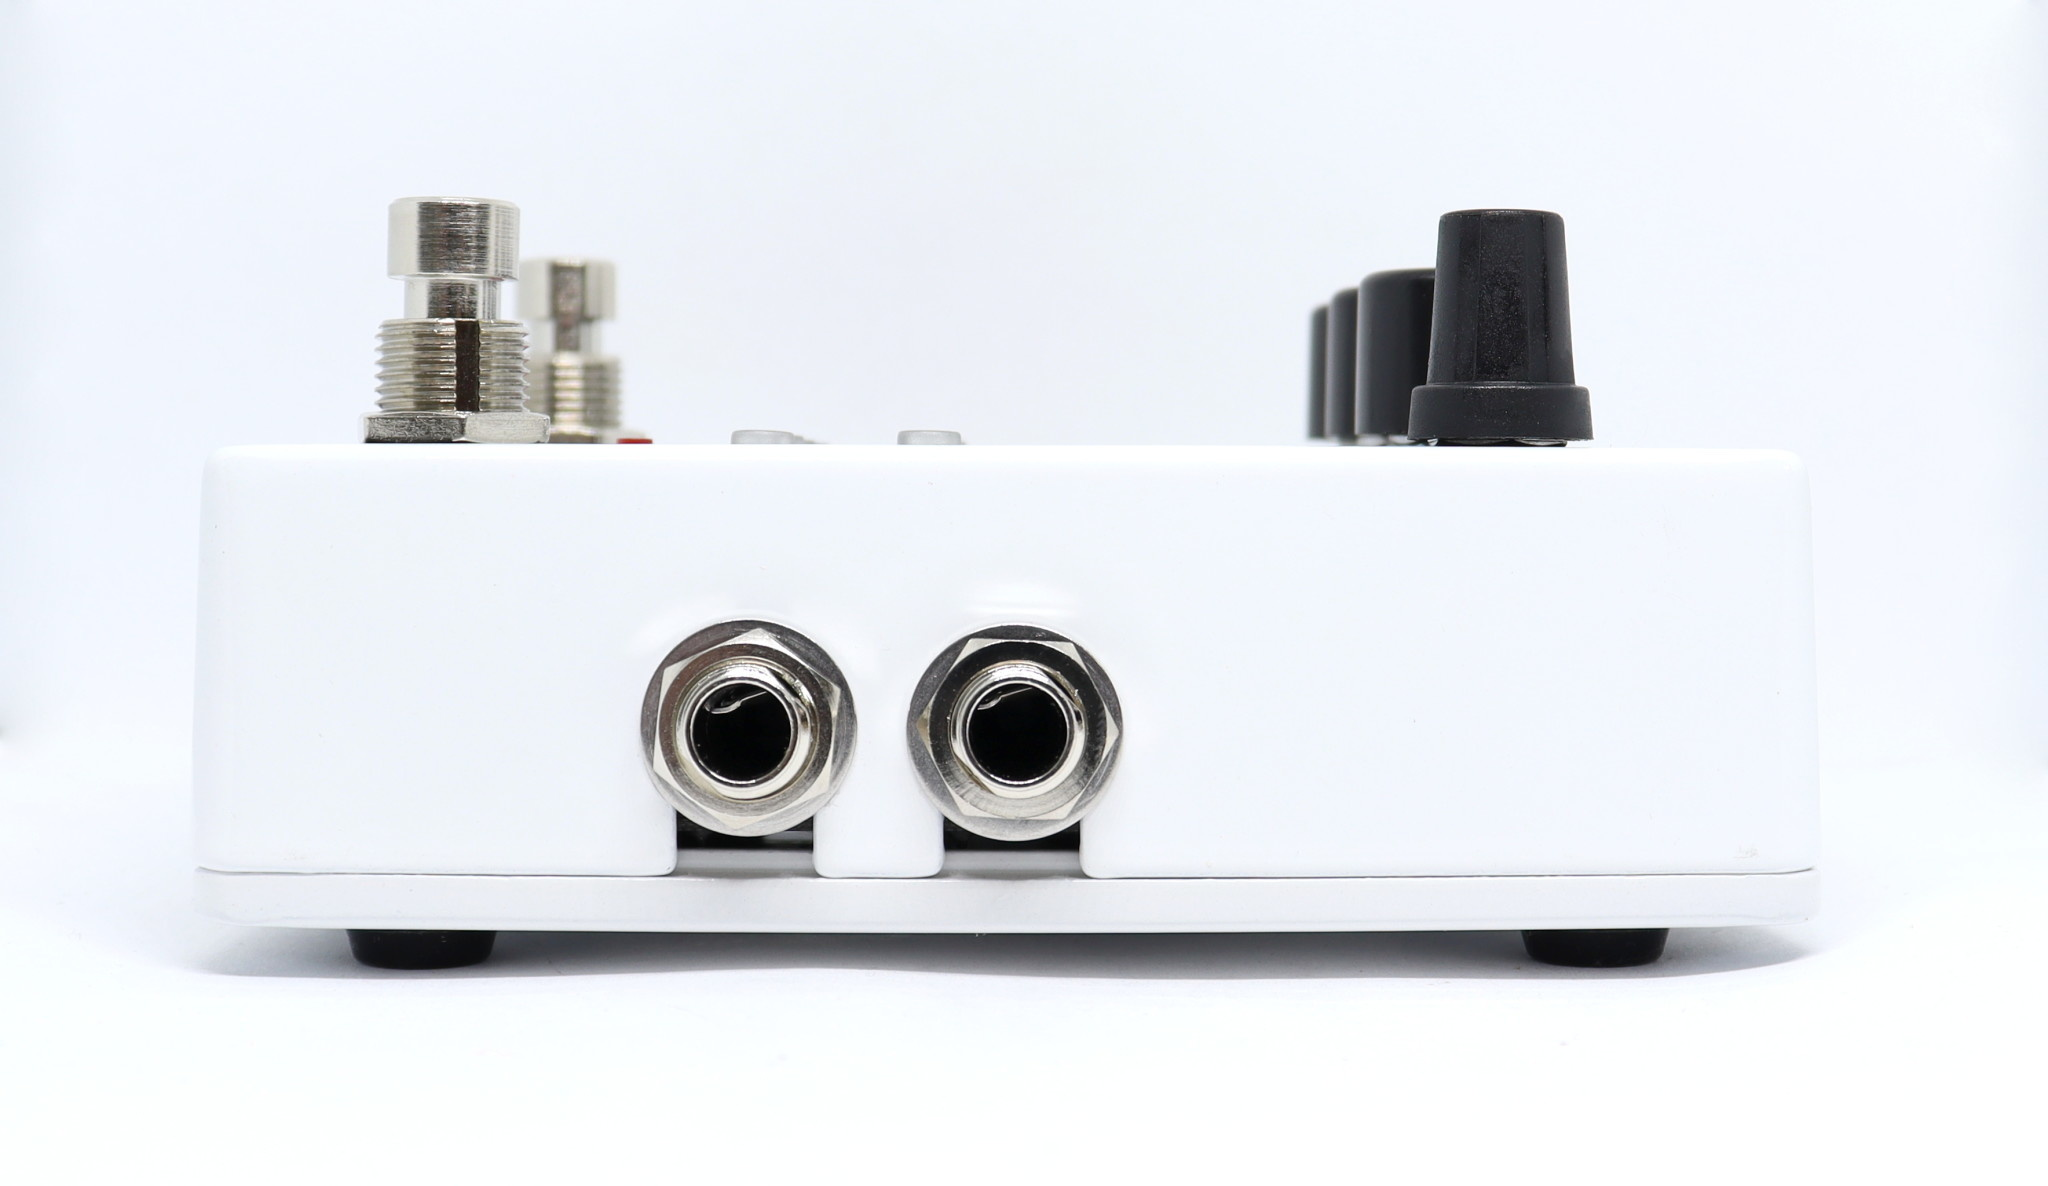 Electro-Harmonix Electro-Harmonix Pitchfork Plus - Polyphonic Pitch Shifter / Harmonizer, 9.6DC-200 PSU included